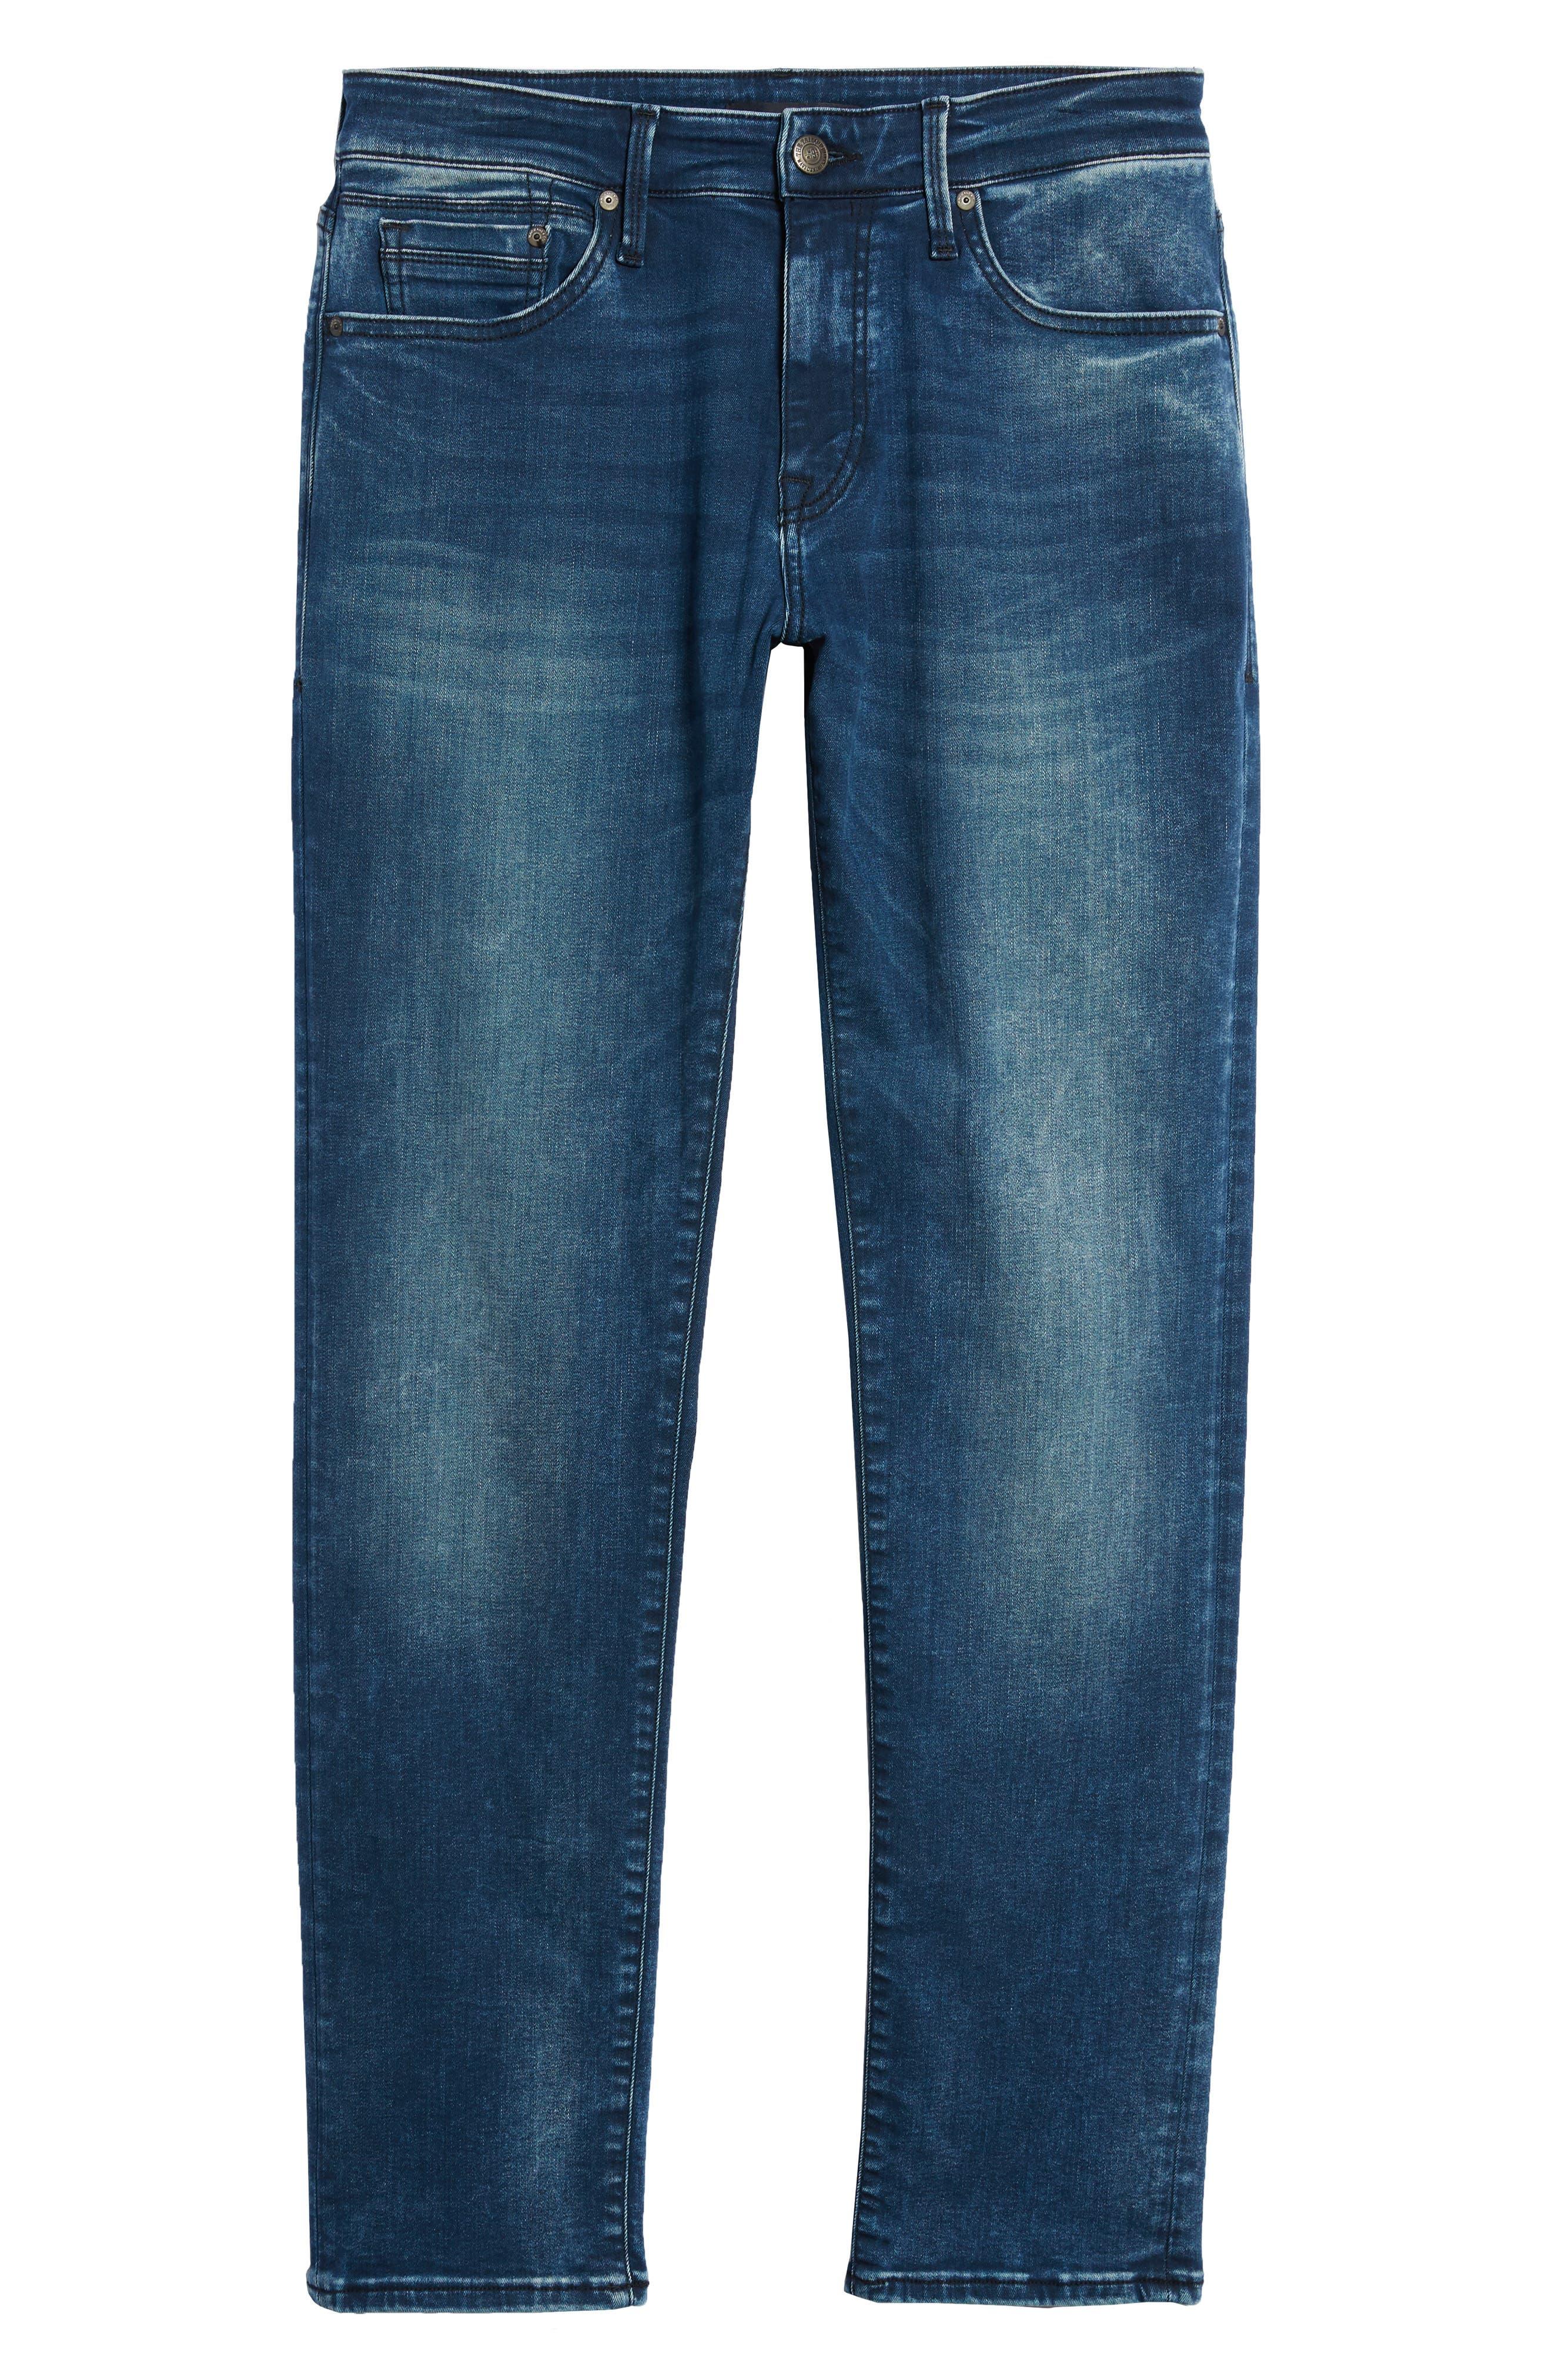 Marcus Slim Straight Leg Jeans,                             Alternate thumbnail 6, color,